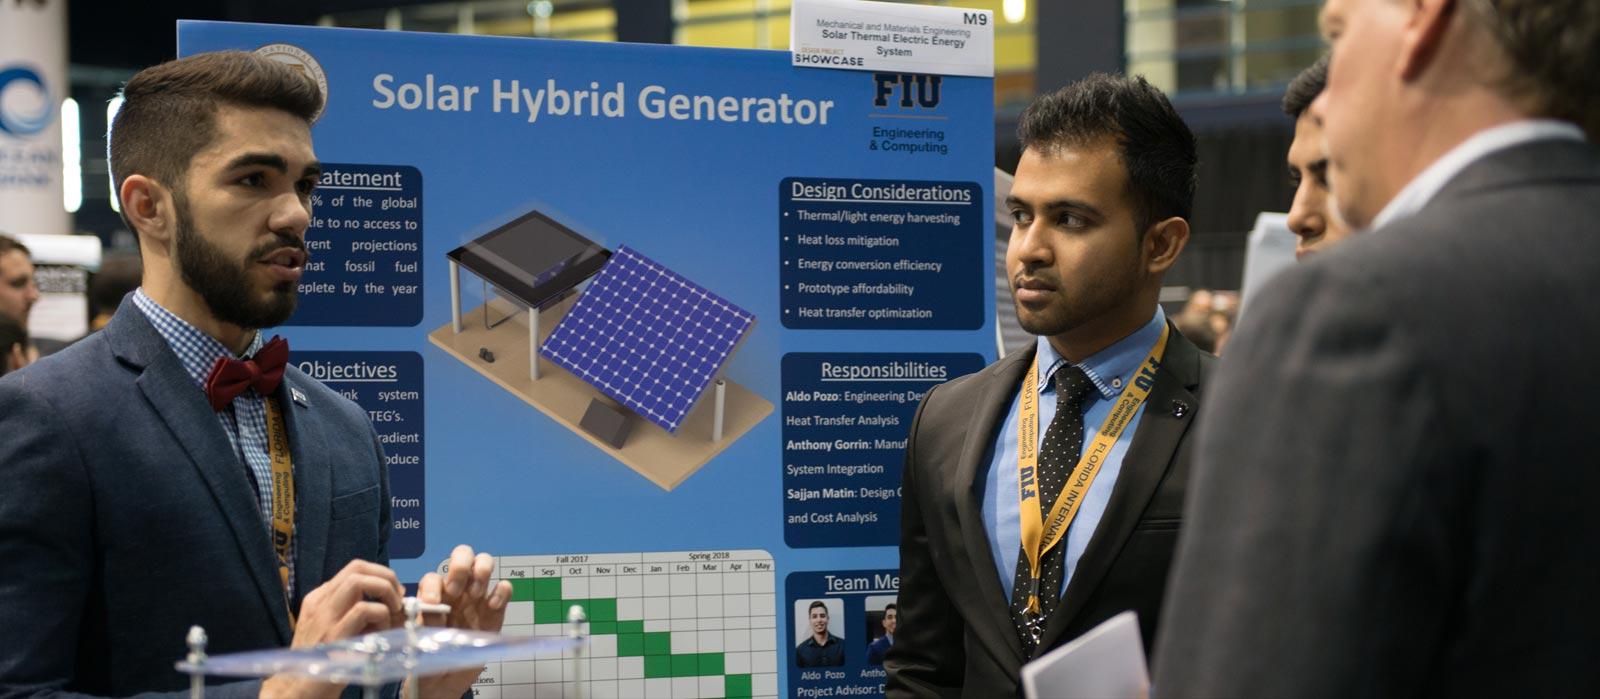 fiu-college-engineering-computing-senior-design-projects-fiu-college-engineering-computing-senior-design-projects-solar-hybrid